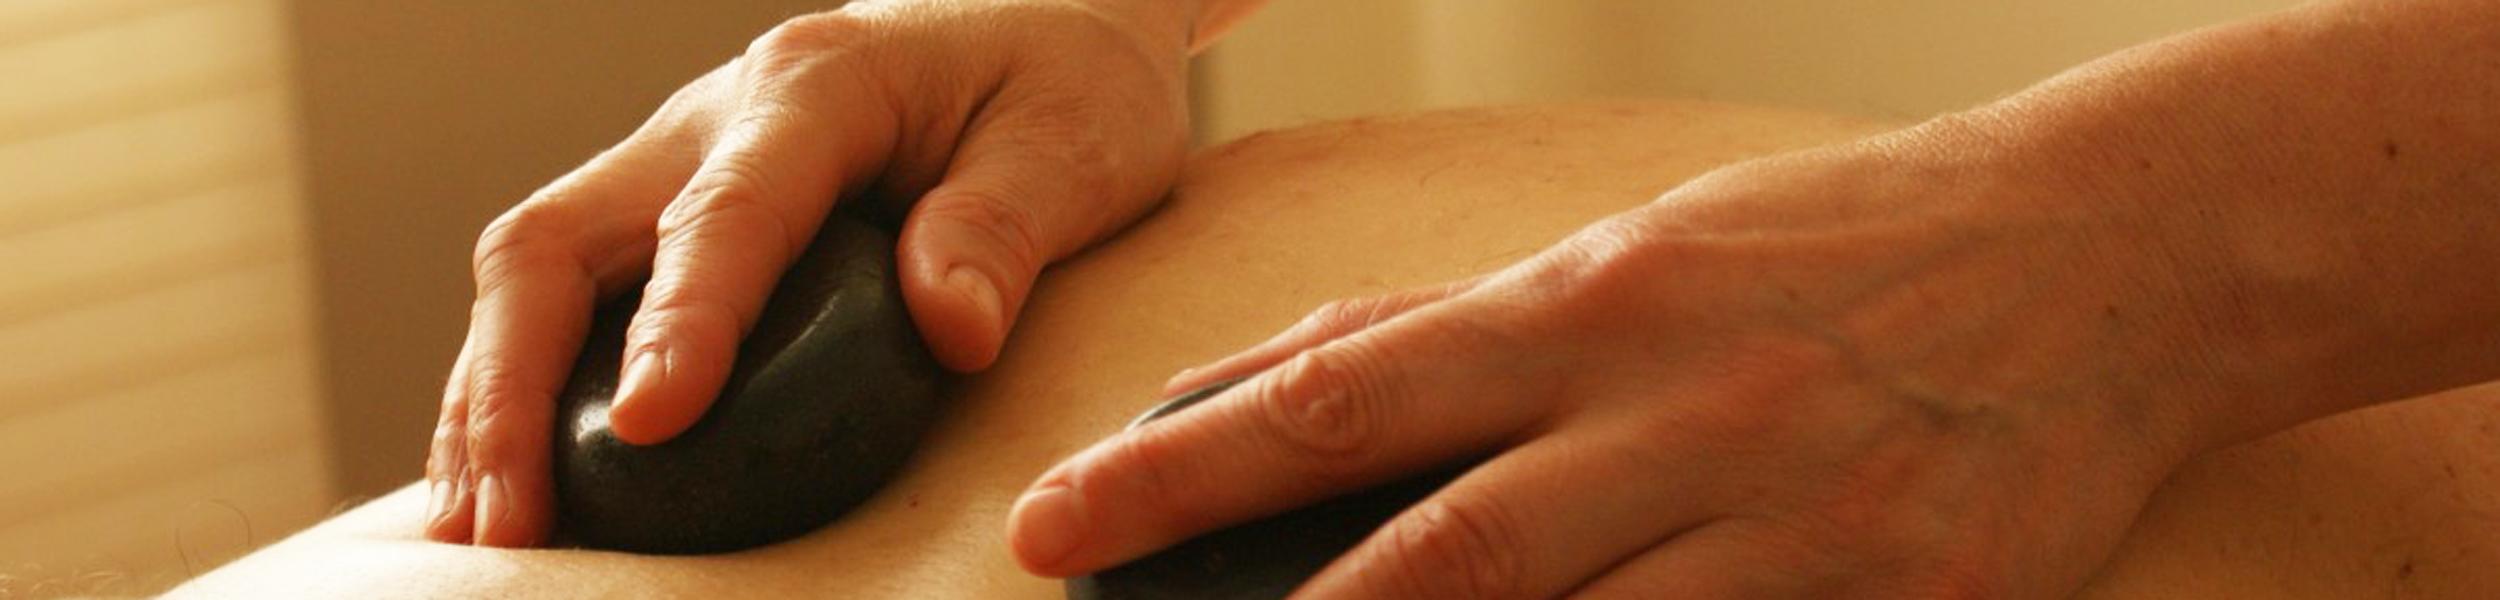 thaise-massage-ede-slide-2